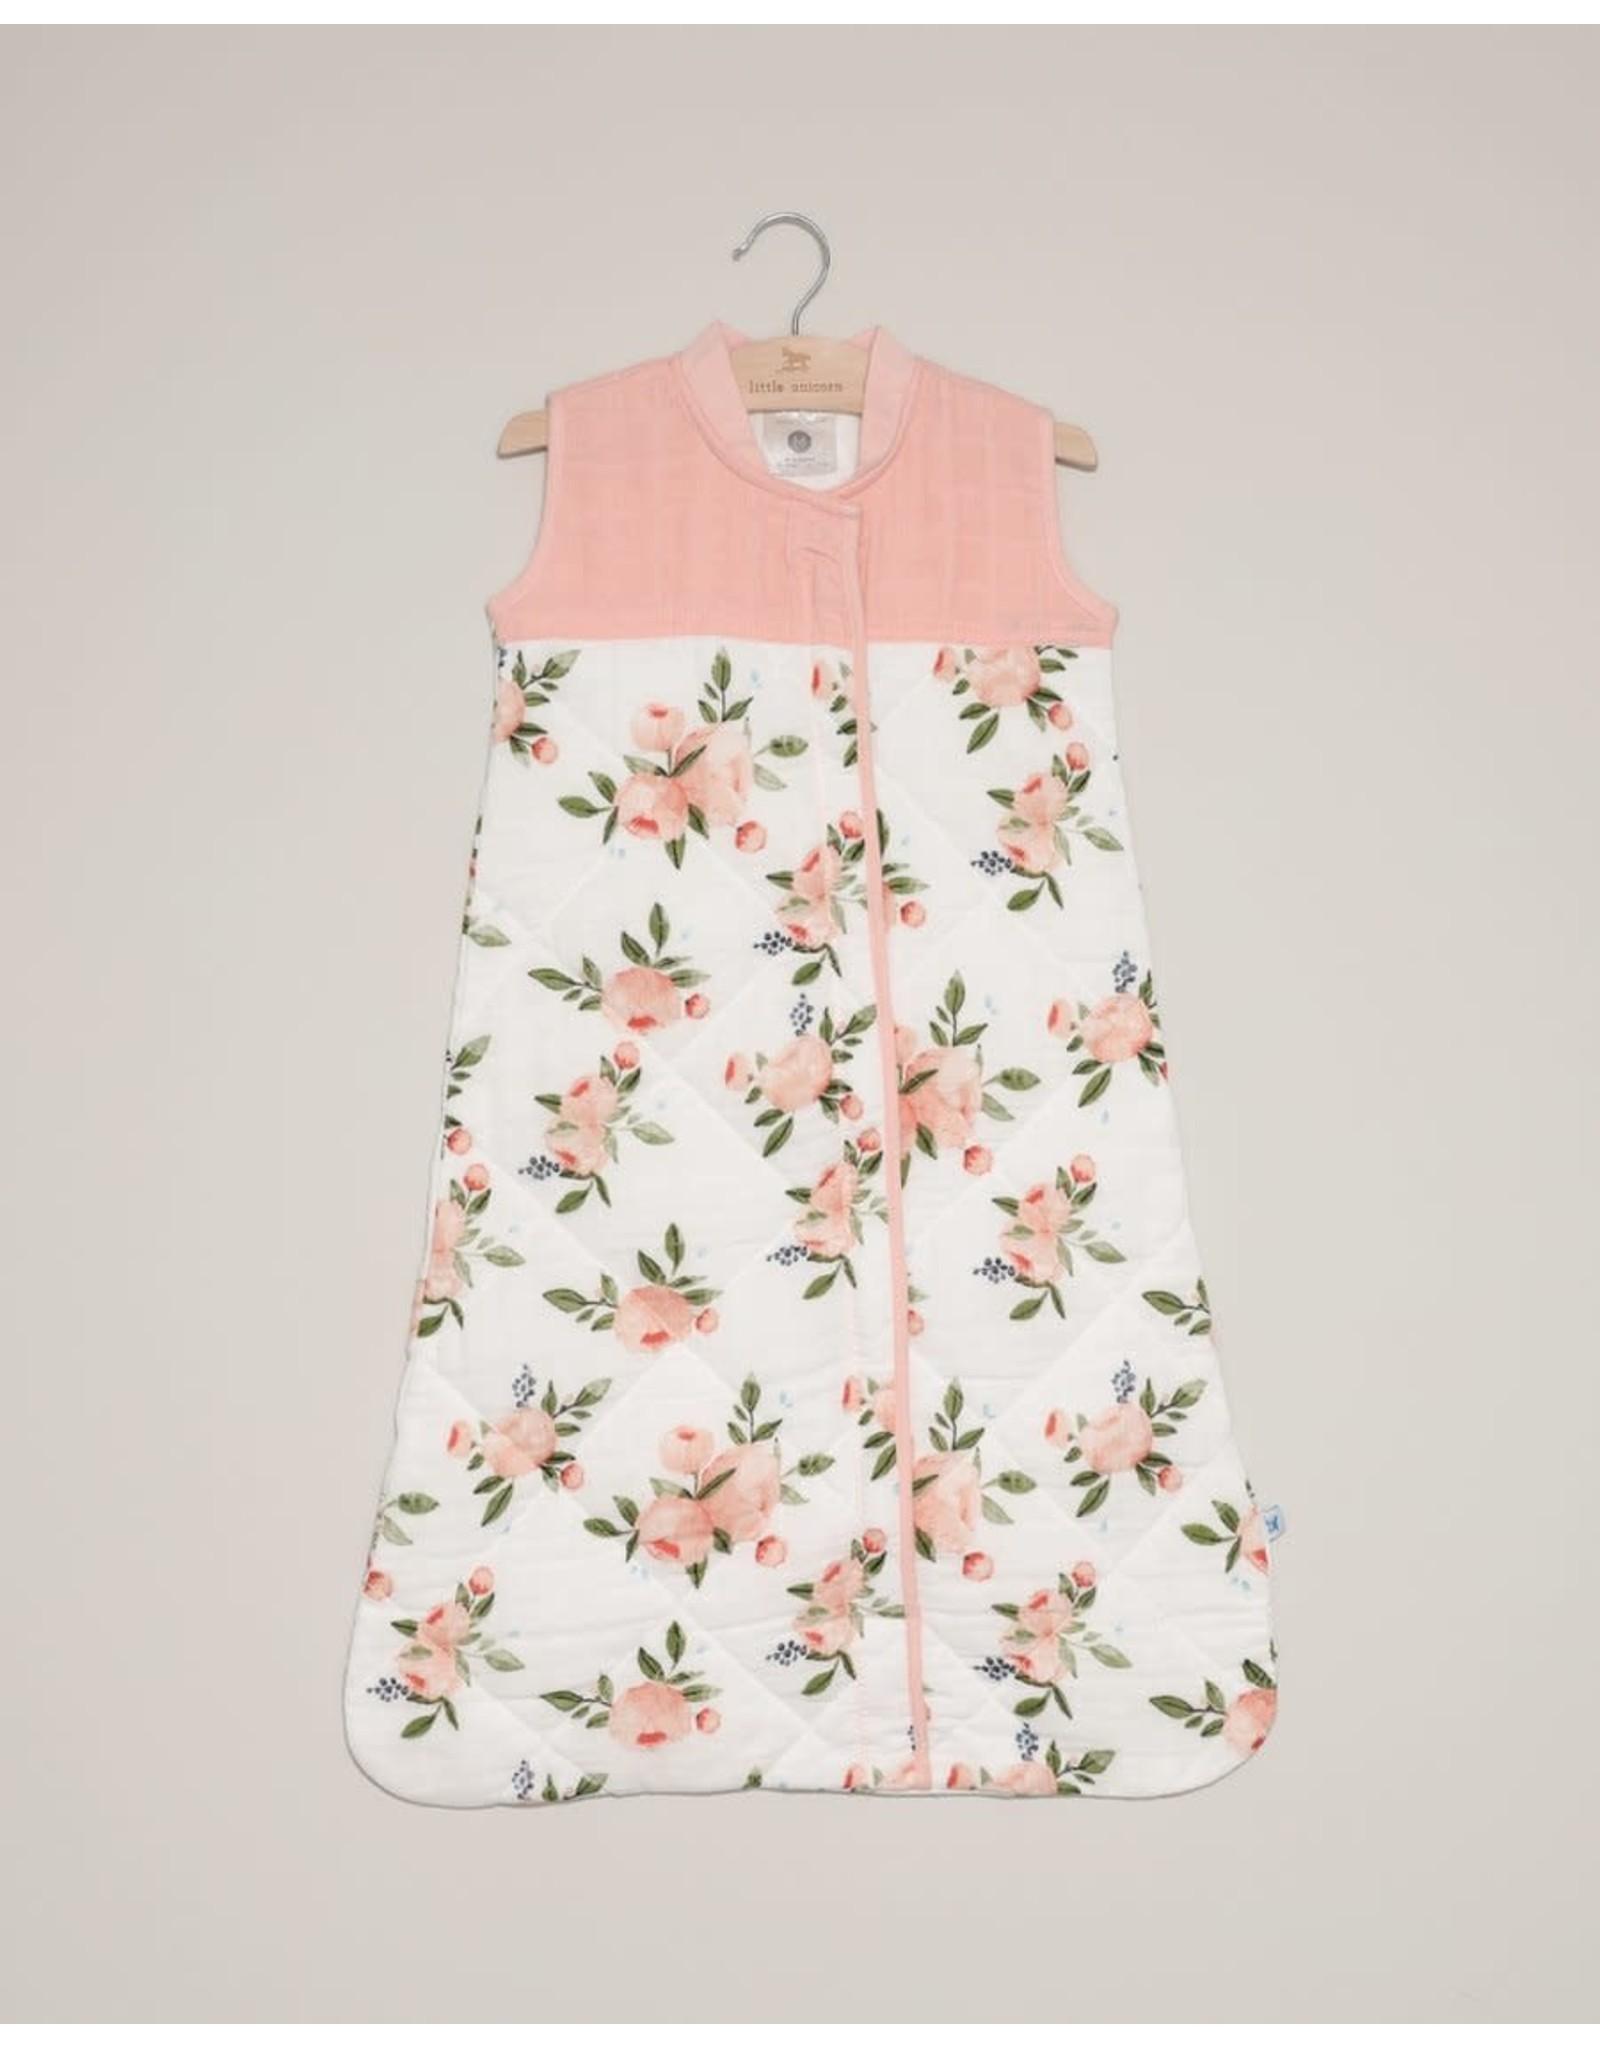 Little Unicorn, LLC Cotton Muslin Quilted Sleep Bag, Medium, Watercolor Roses